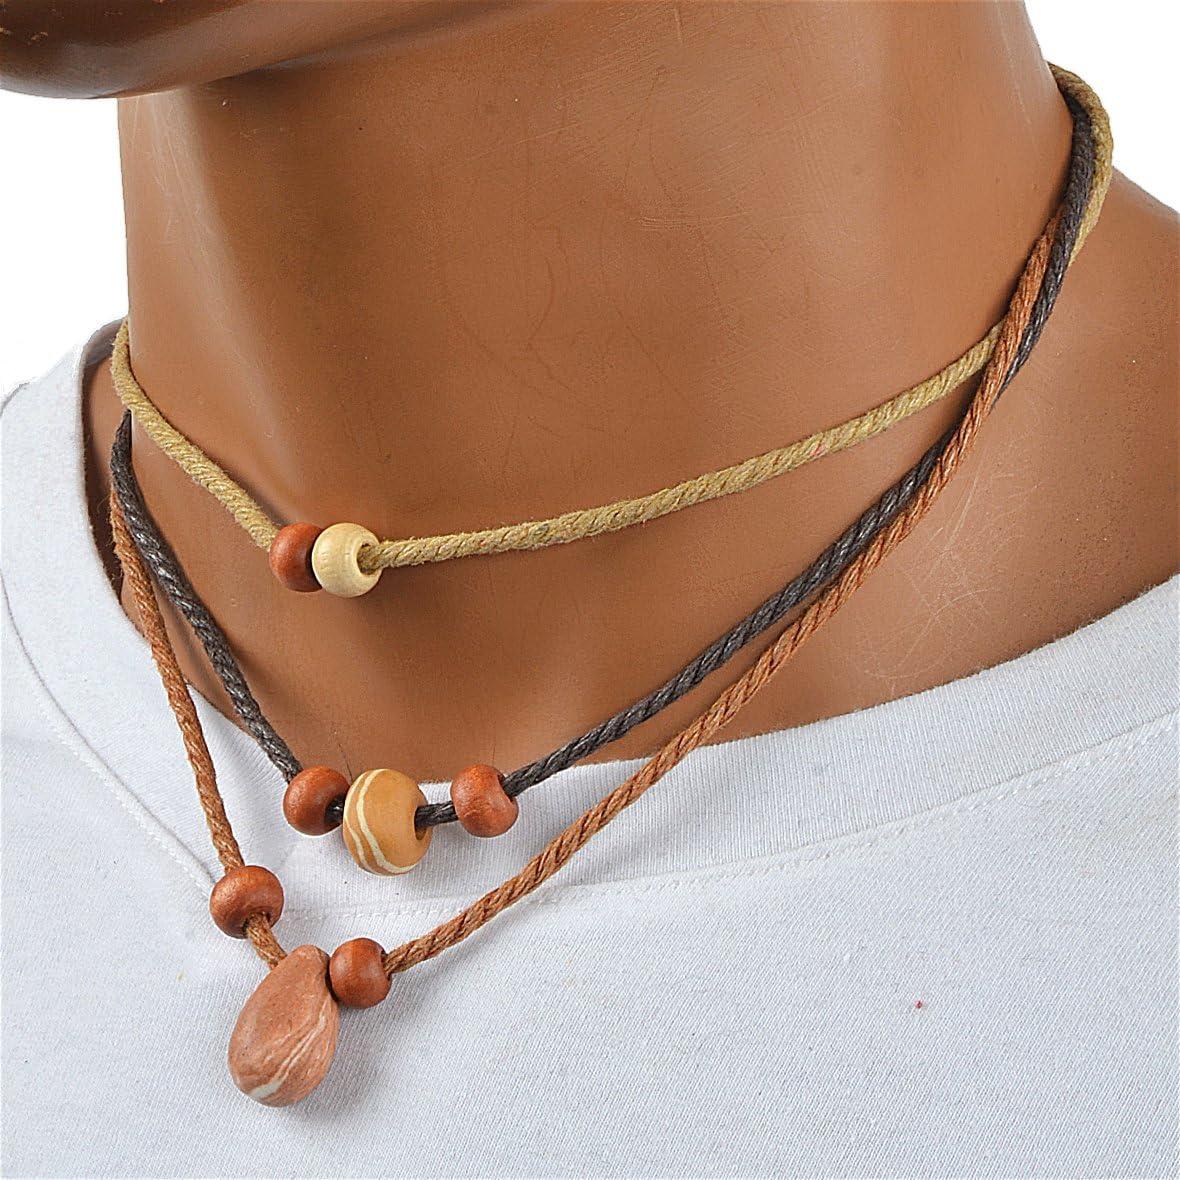 3L-Khaki JESSE /· RENA Mens Jewelry Hemp Beach Choker Pendant Surfer Necklace Accessories